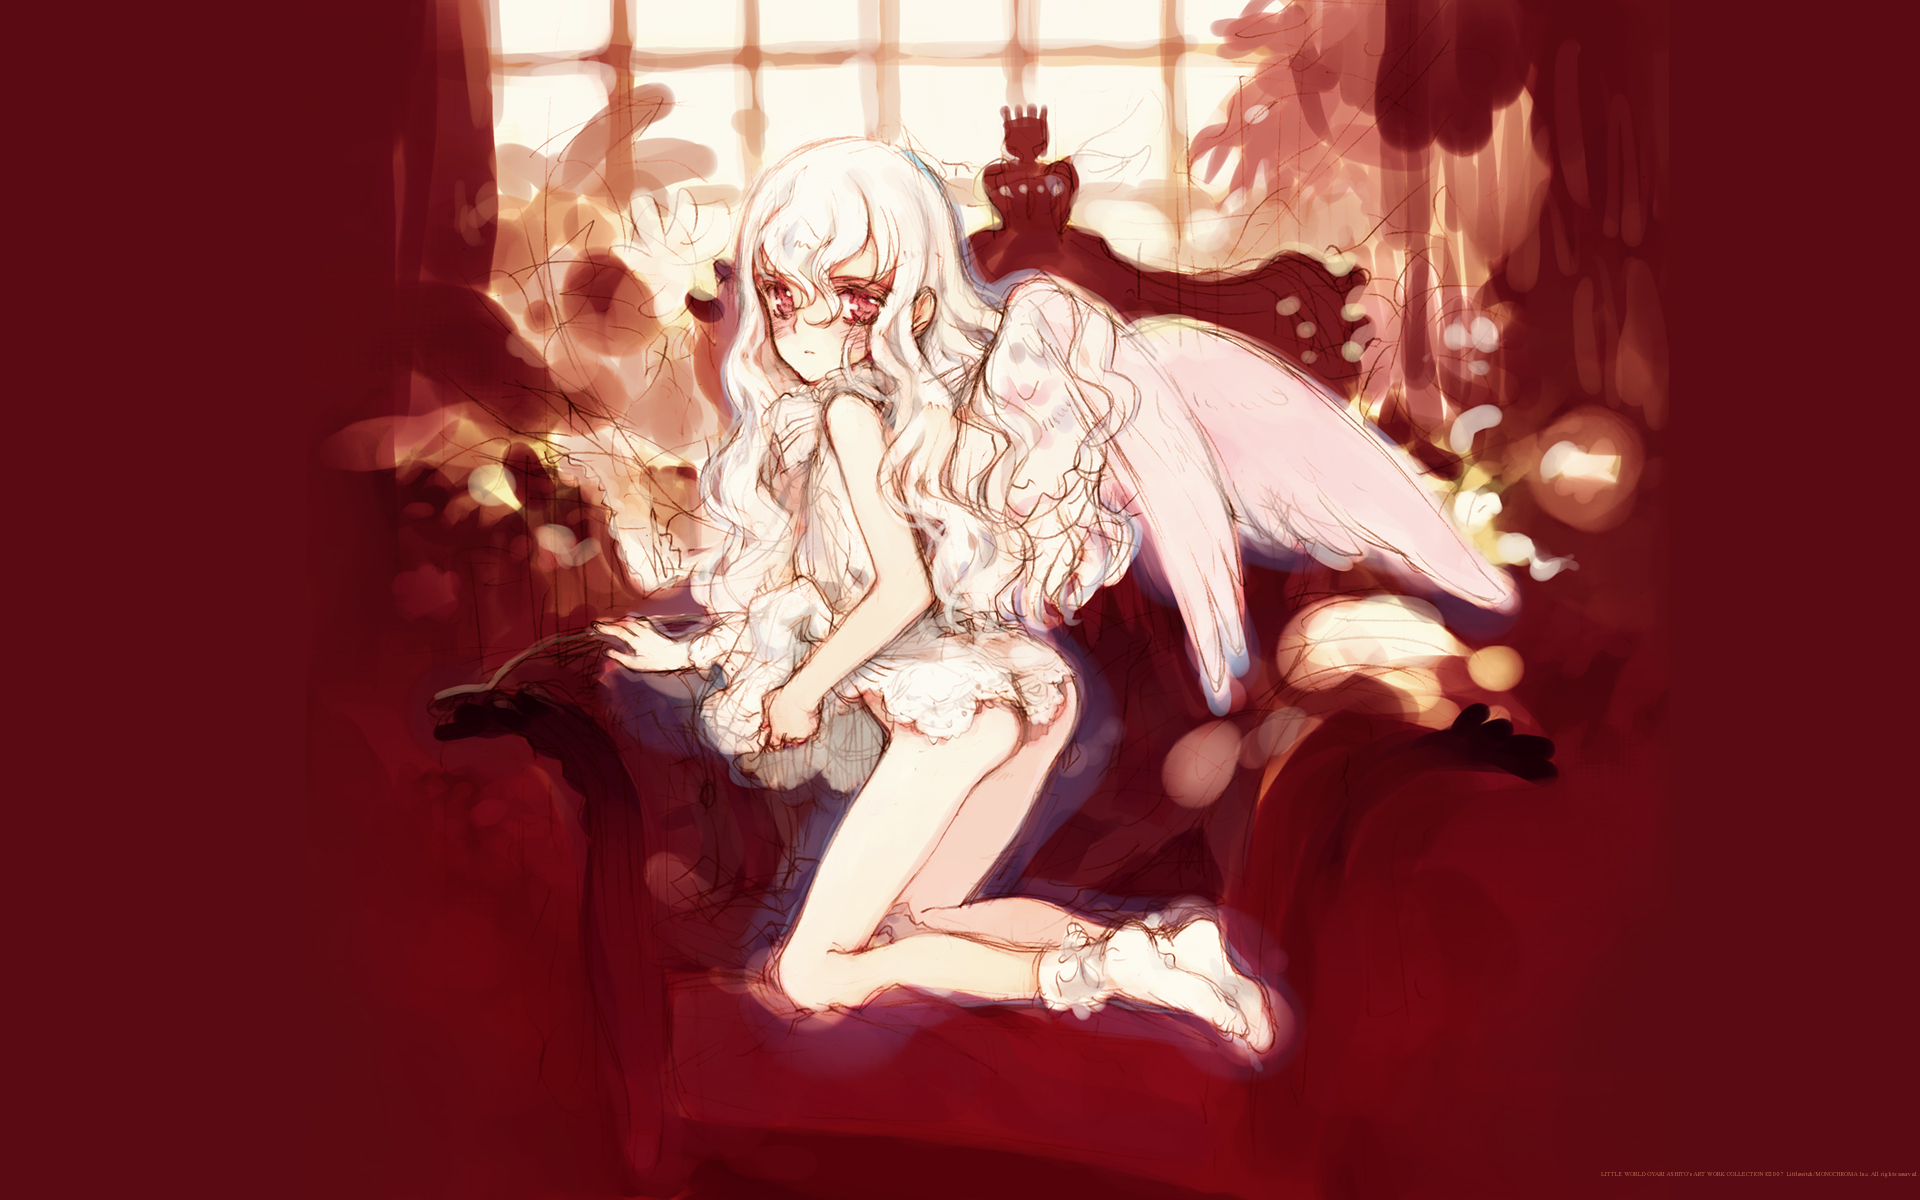 littlewitch oyari_ashito panties red underwear wings